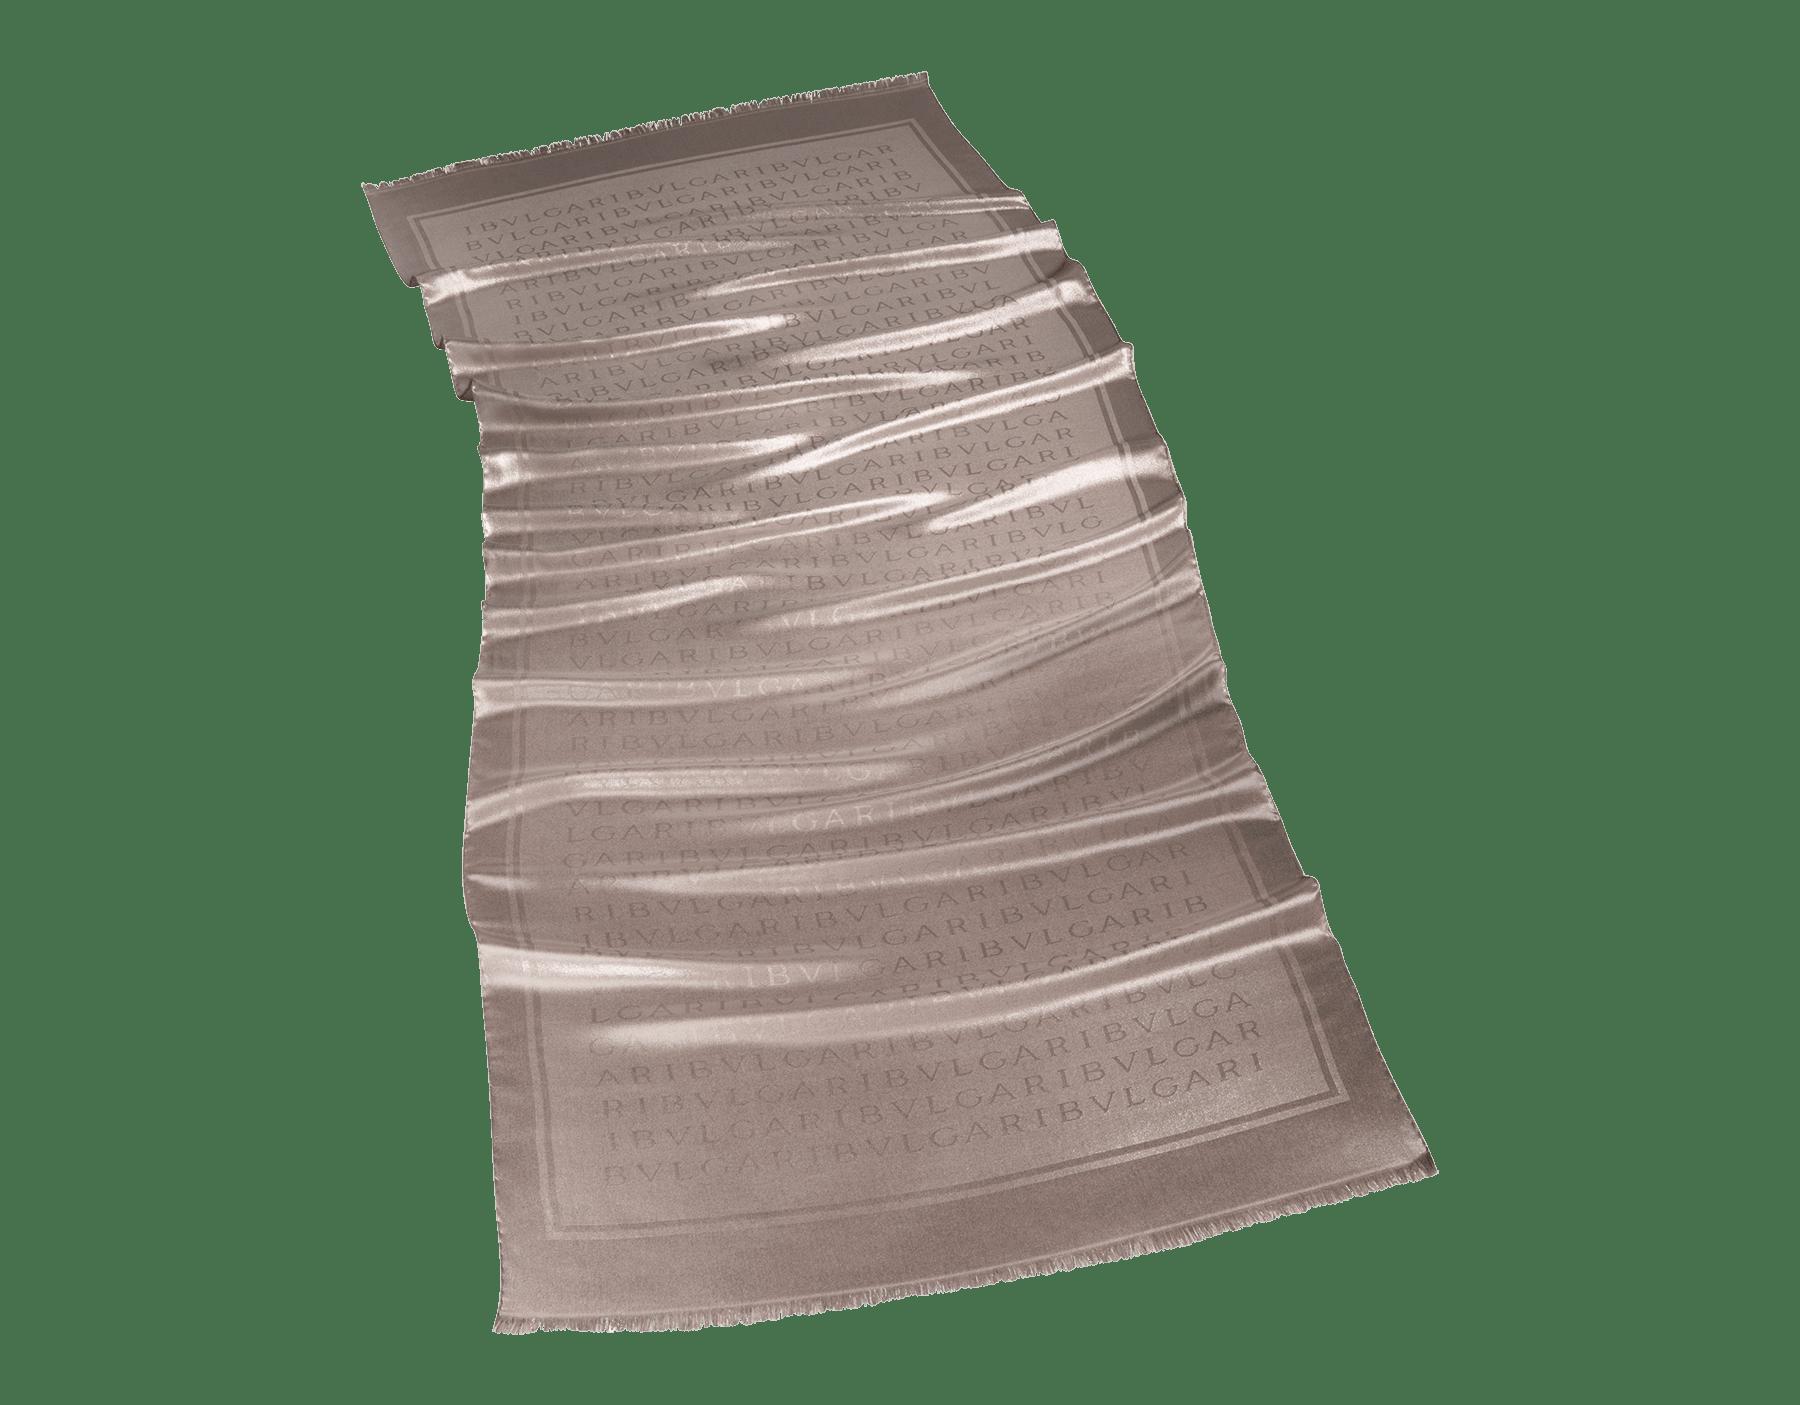 Pearl Lettere L Metal stole in fine silk. 244221 image 1